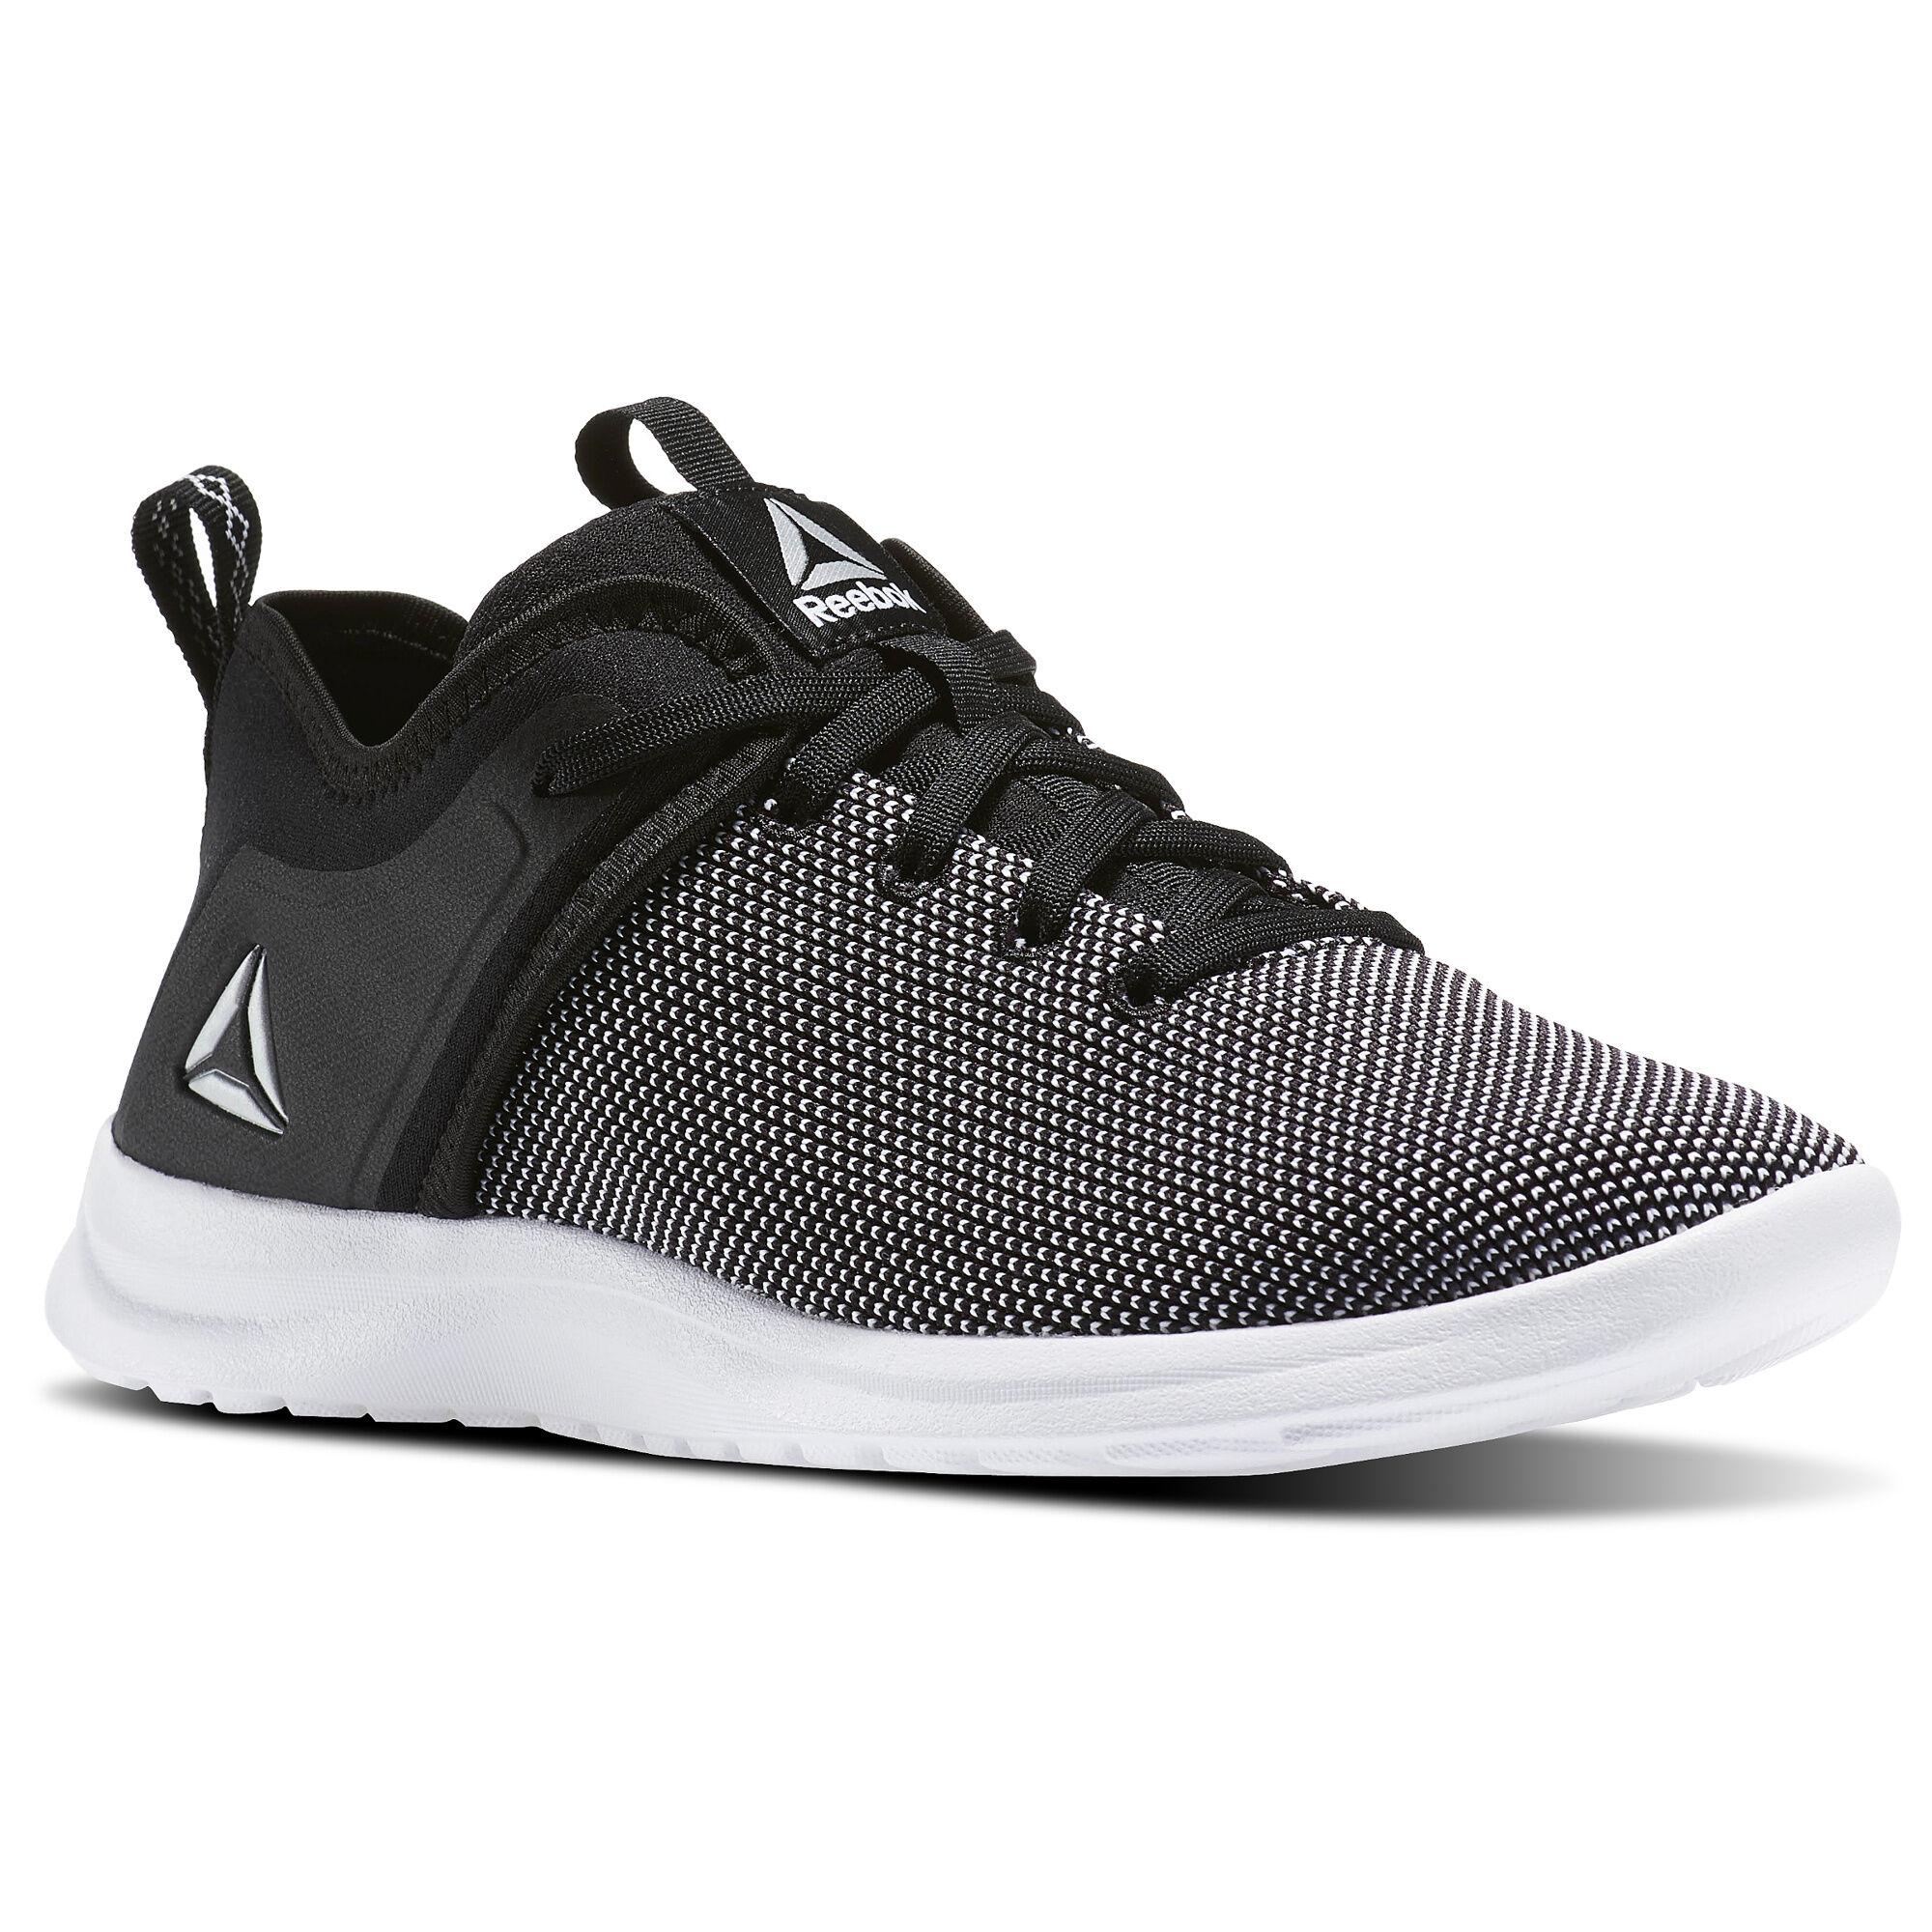 Womens Solestead Fitness Shoes Reebok QjOAe